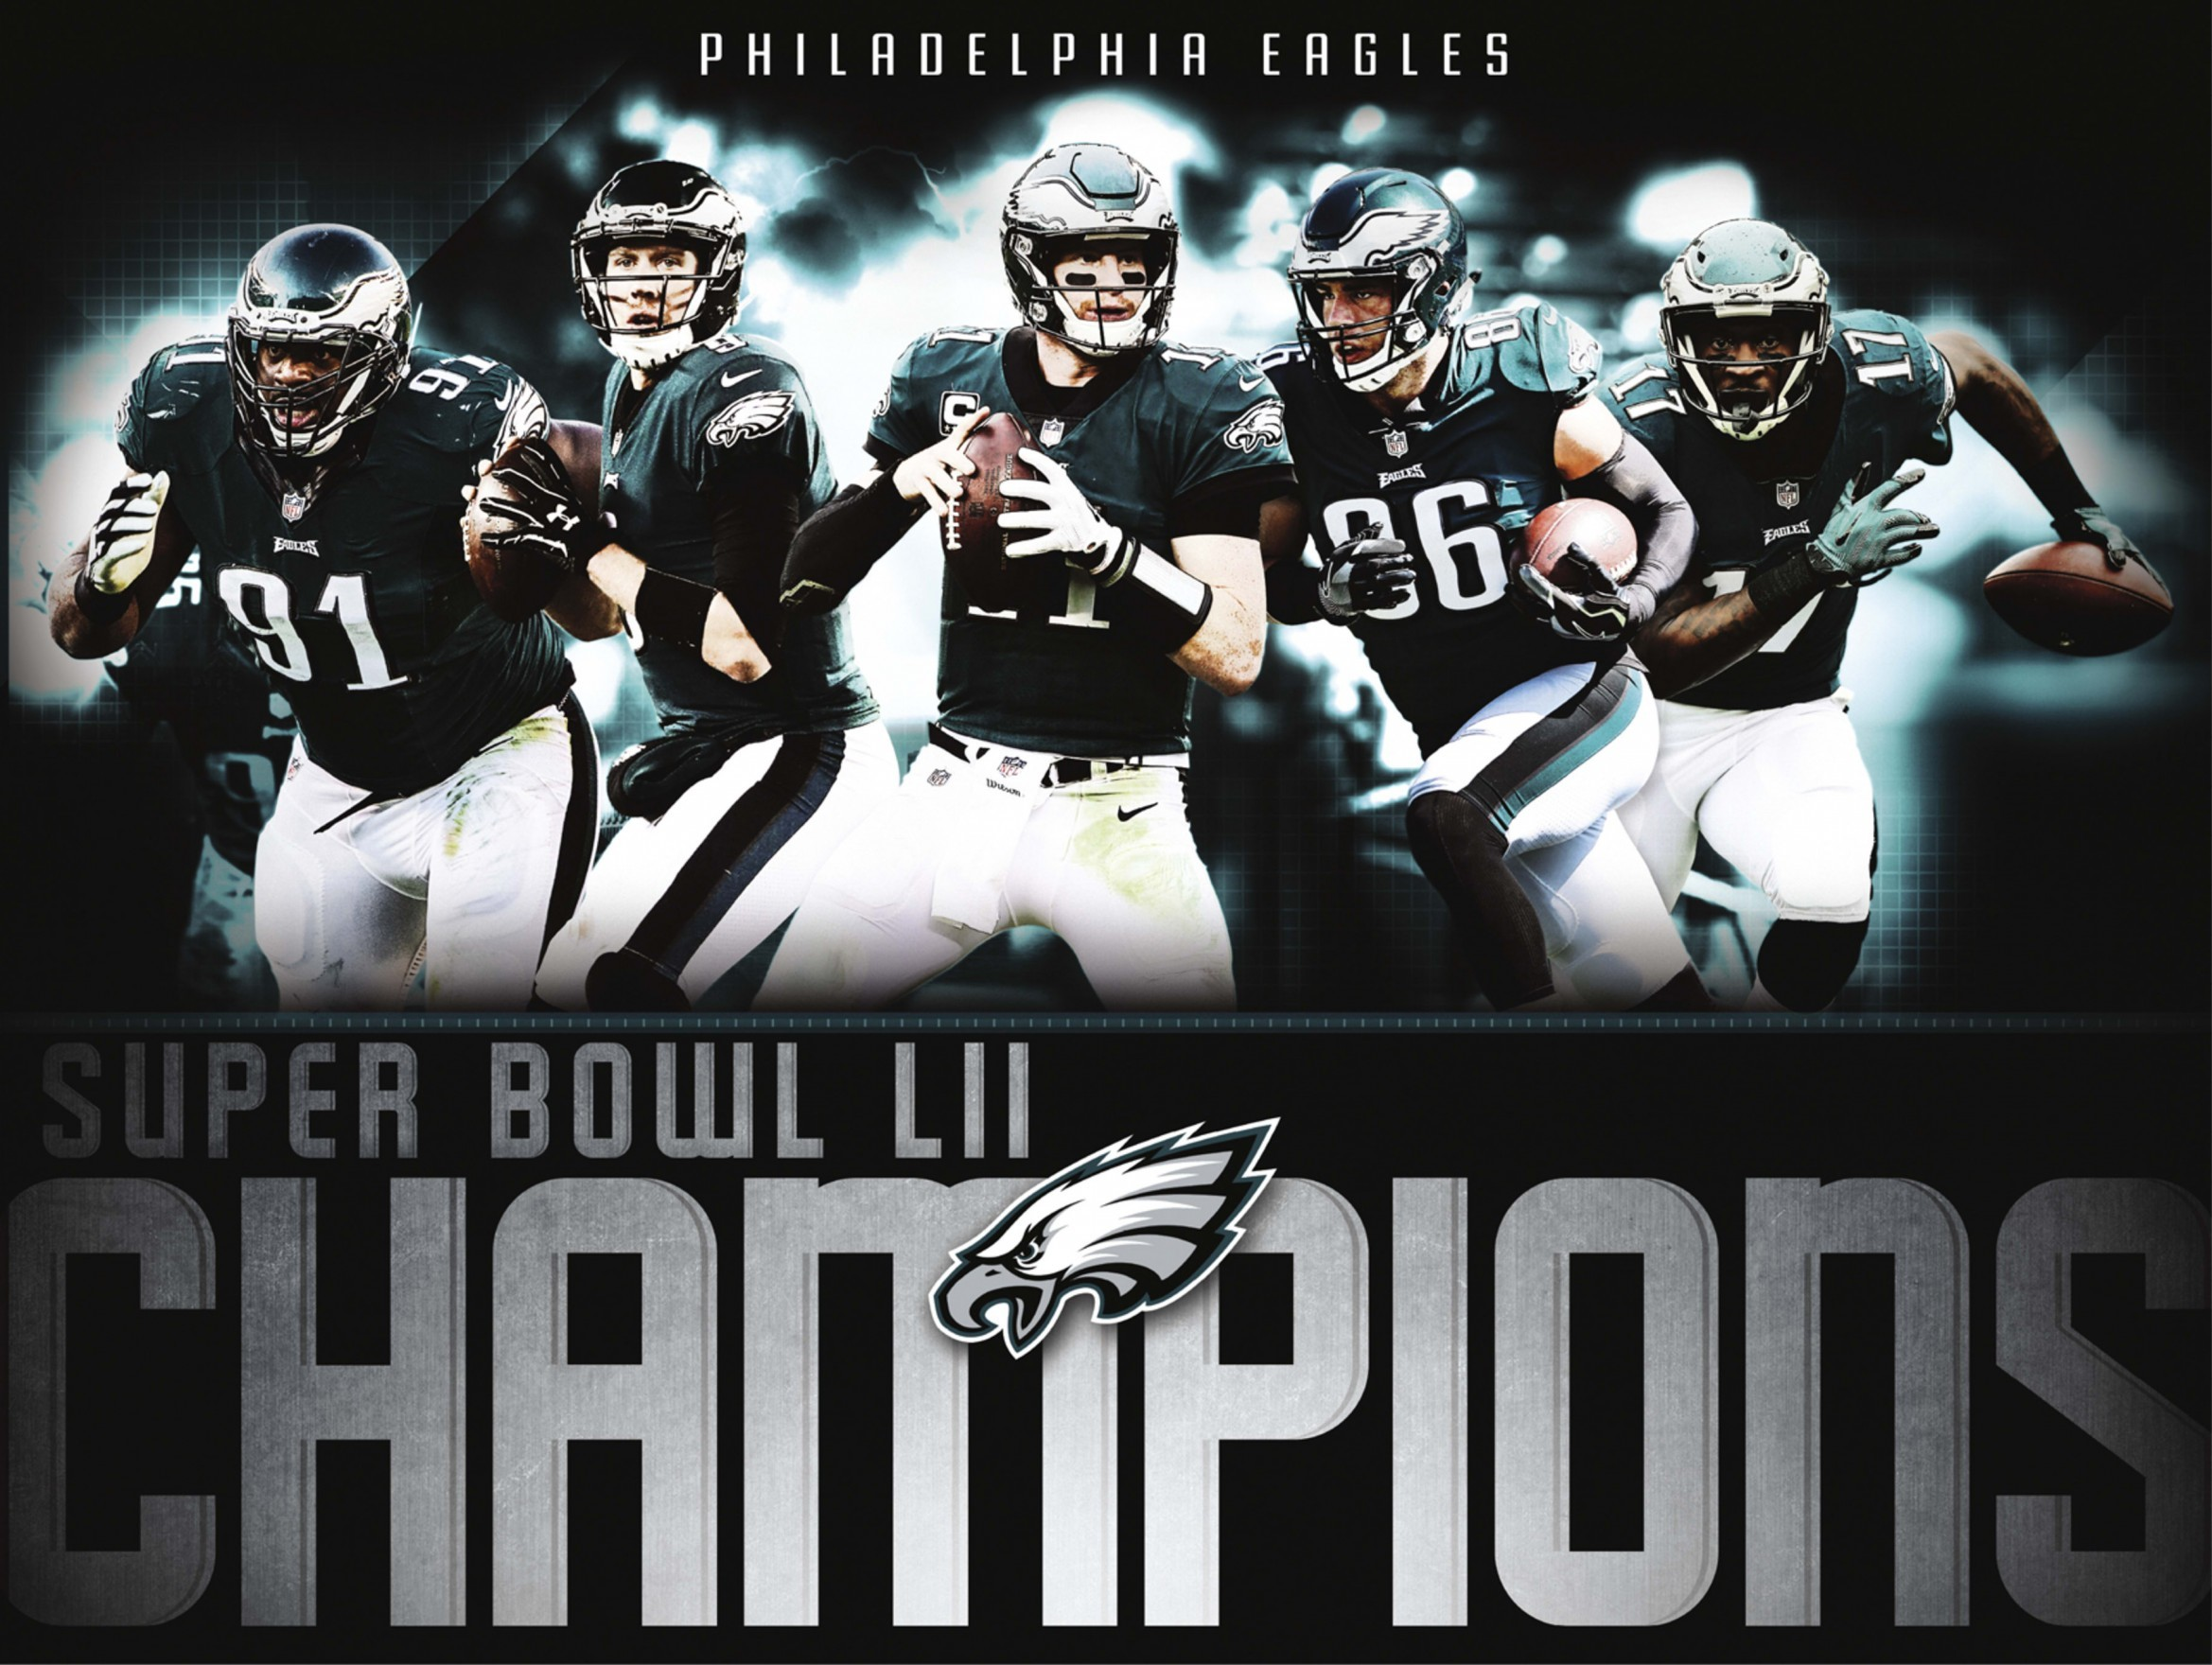 Philadelphia Eagles Wallpaper HD (76+